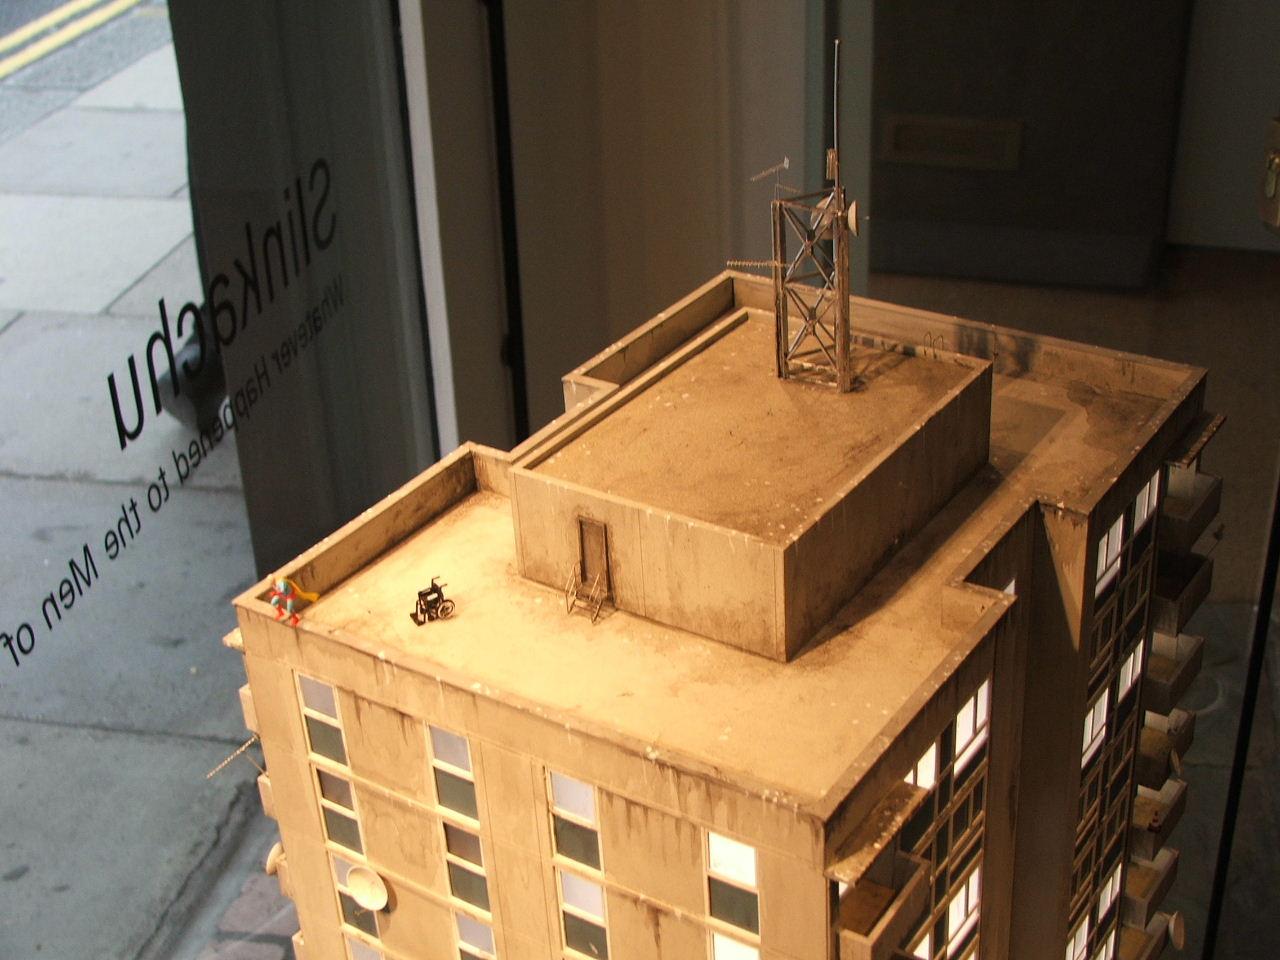 building-installation-detail-2